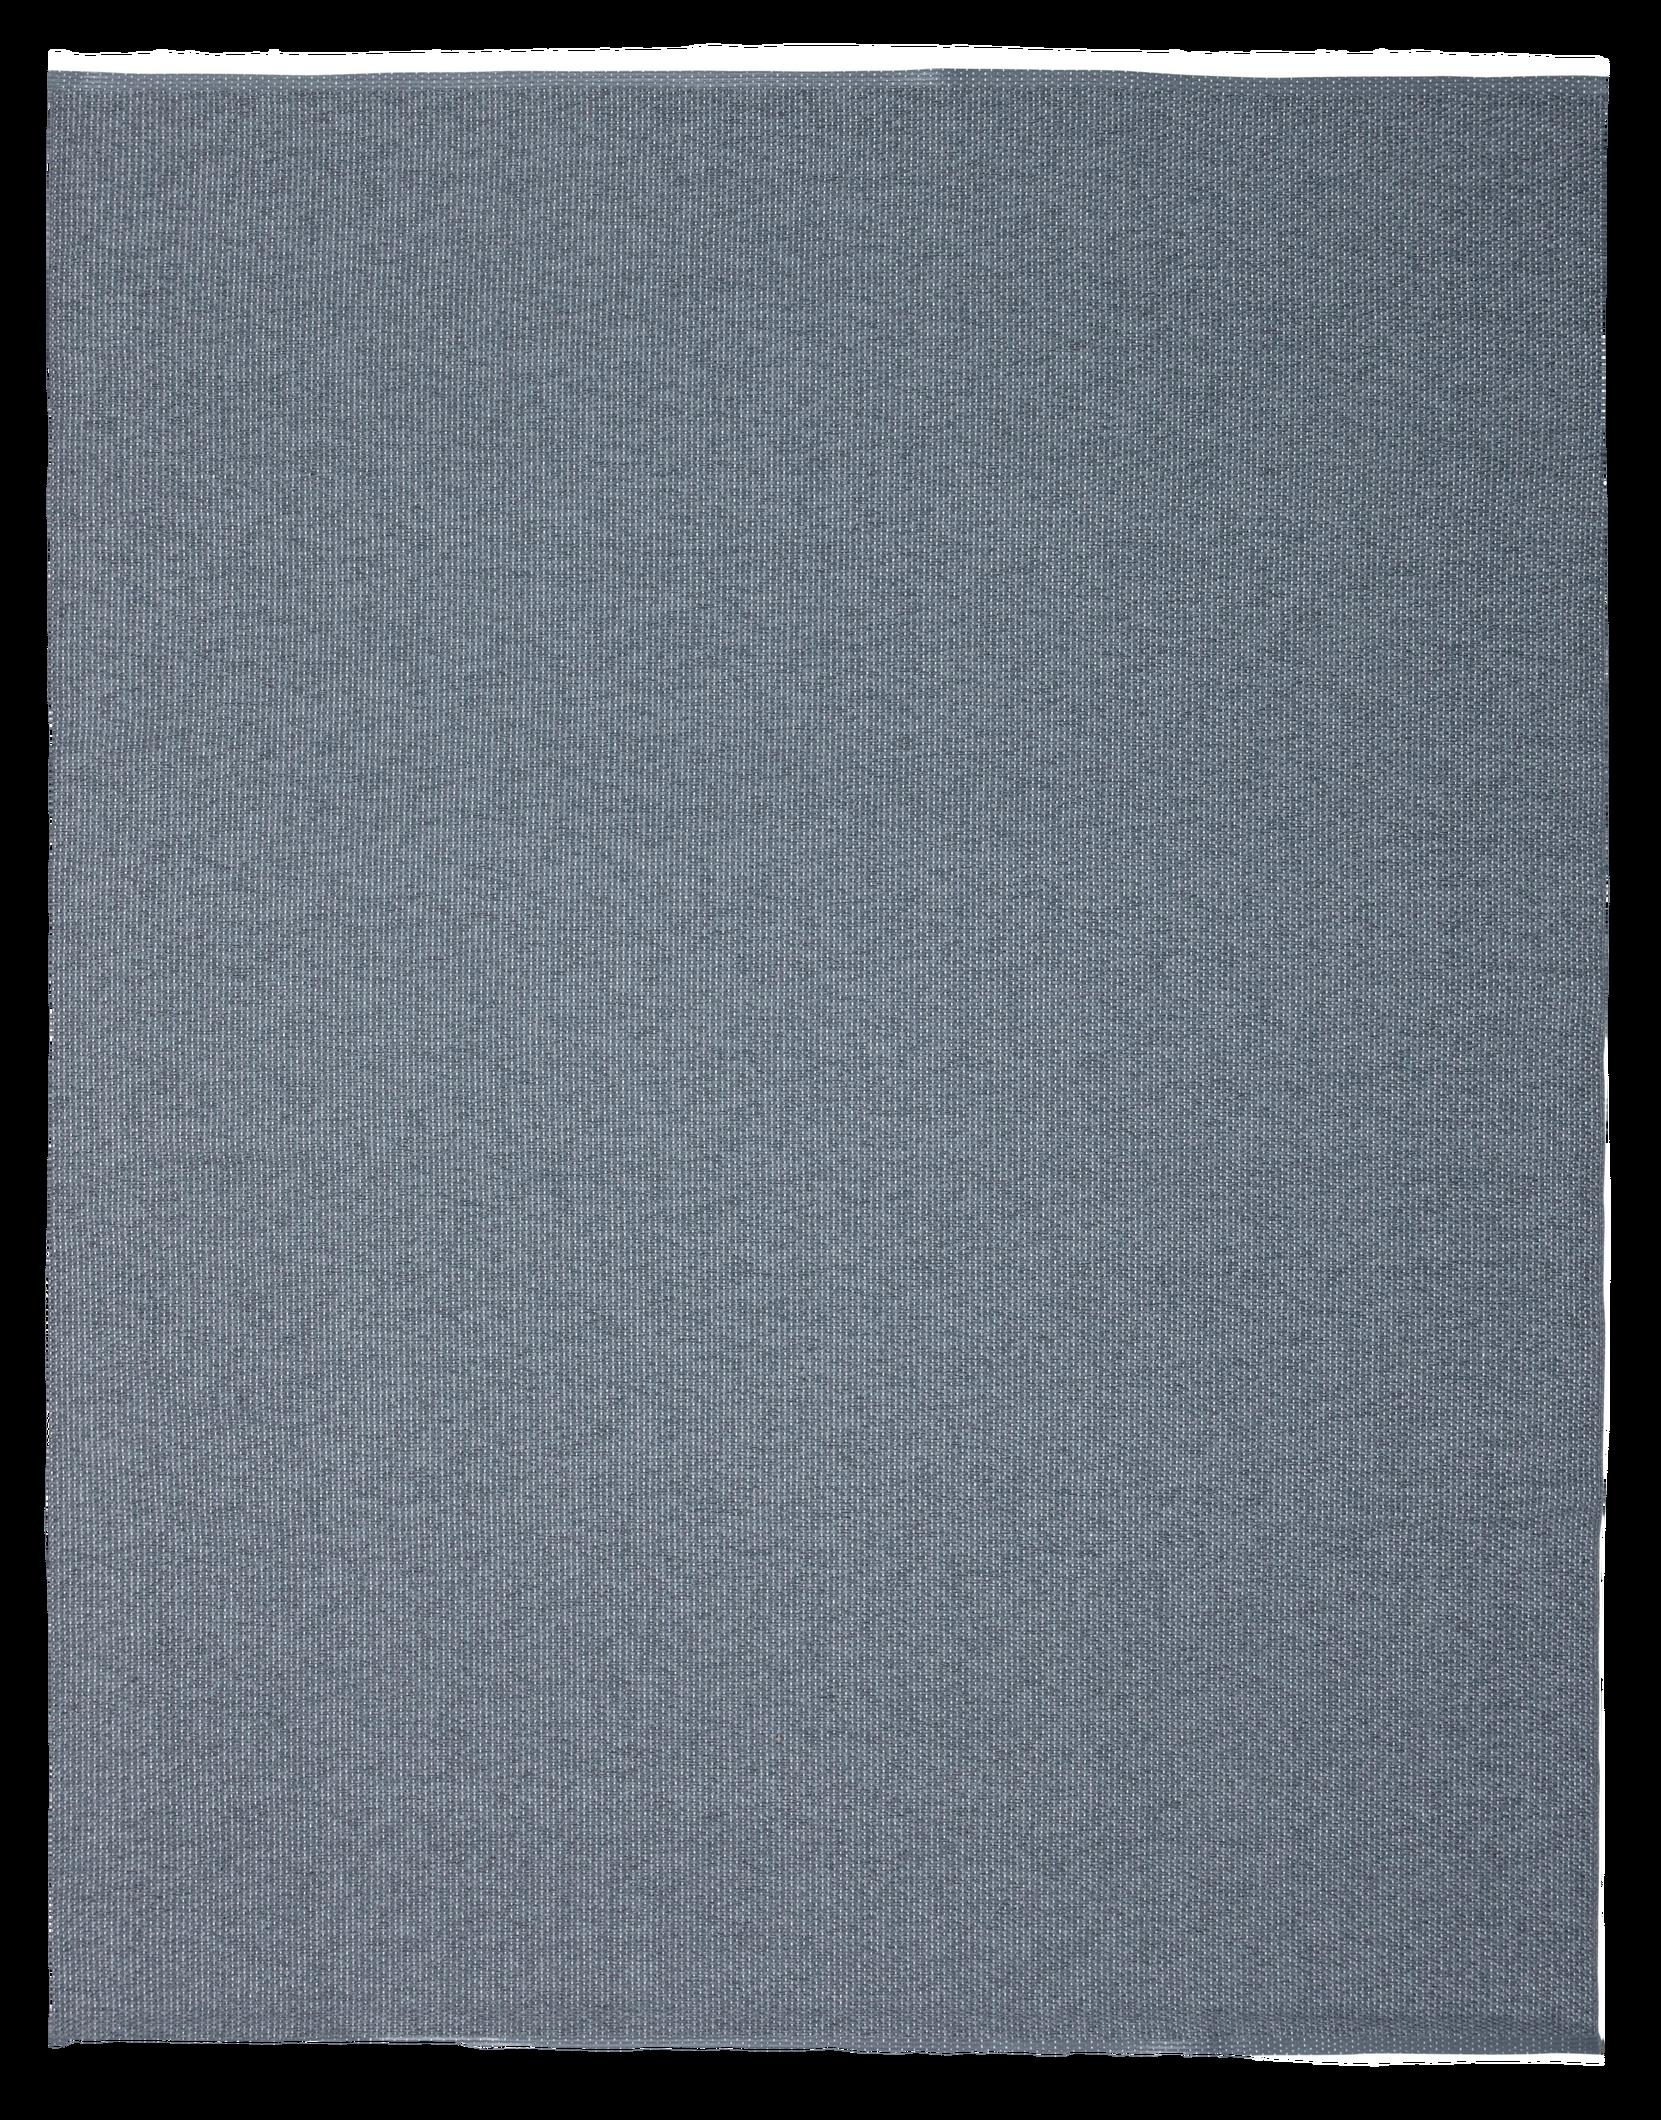 Plain-matto 200 x 250 cm